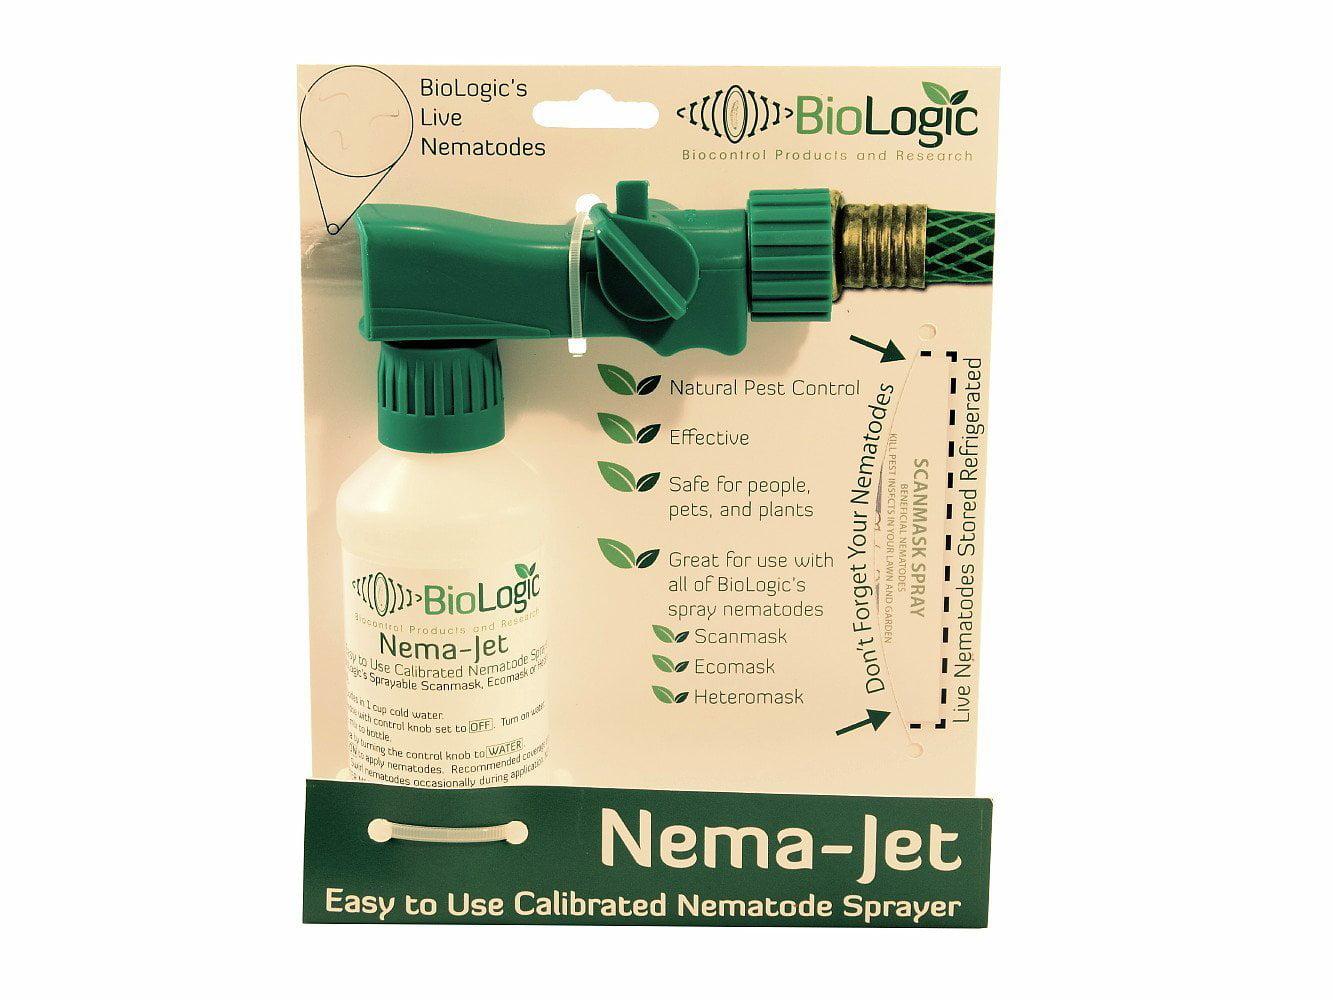 Nema-Jet Nematode Sprayer Easy to Use Use with Biologic Easy Spray Nematodes by Sprayers